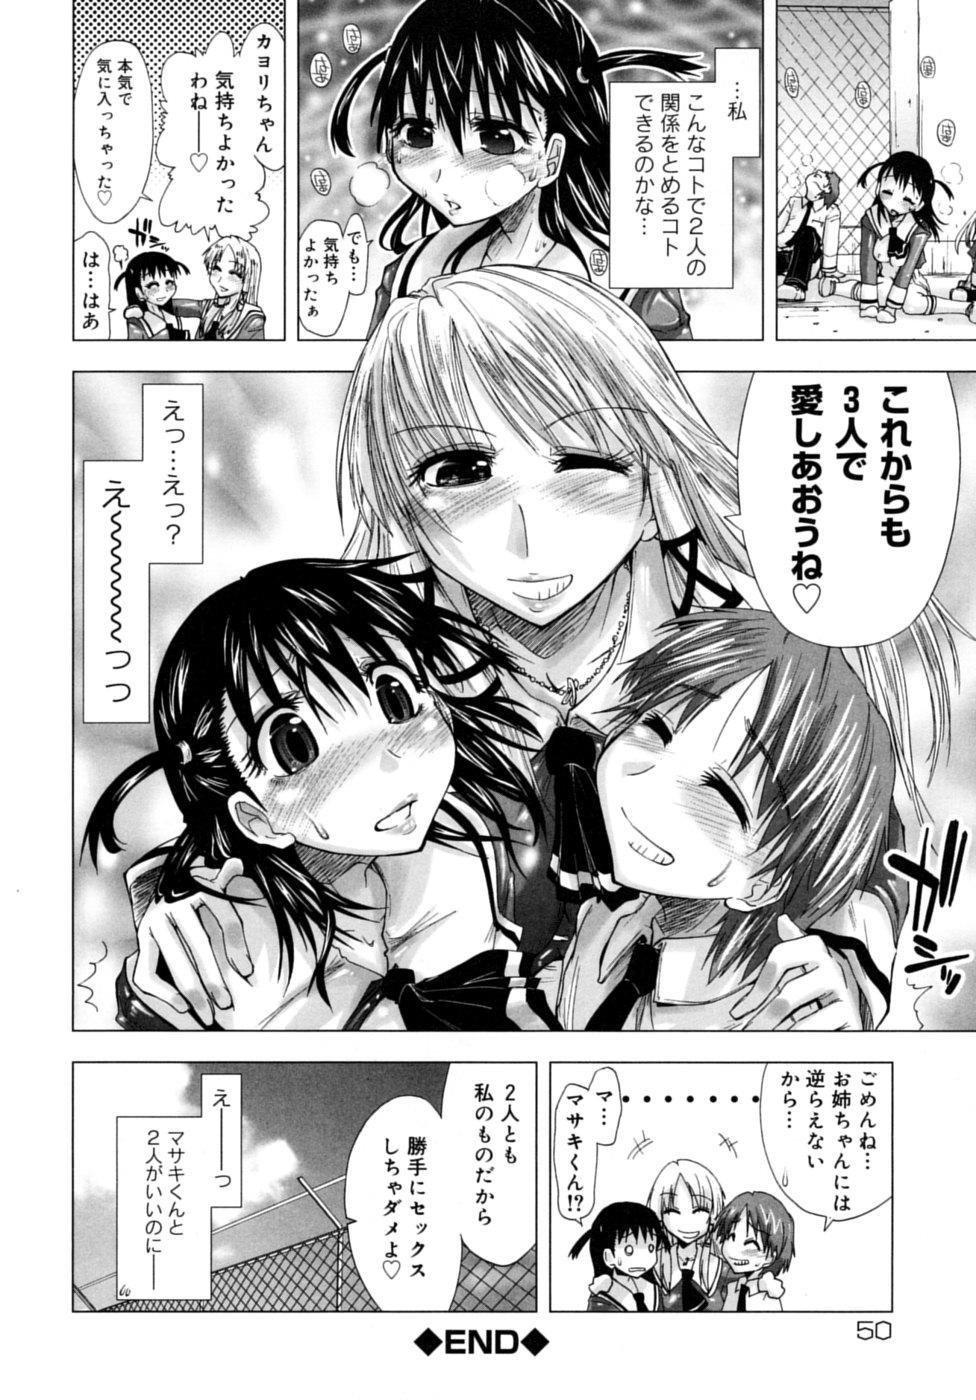 Houkago Shoujo - After School Girls 49